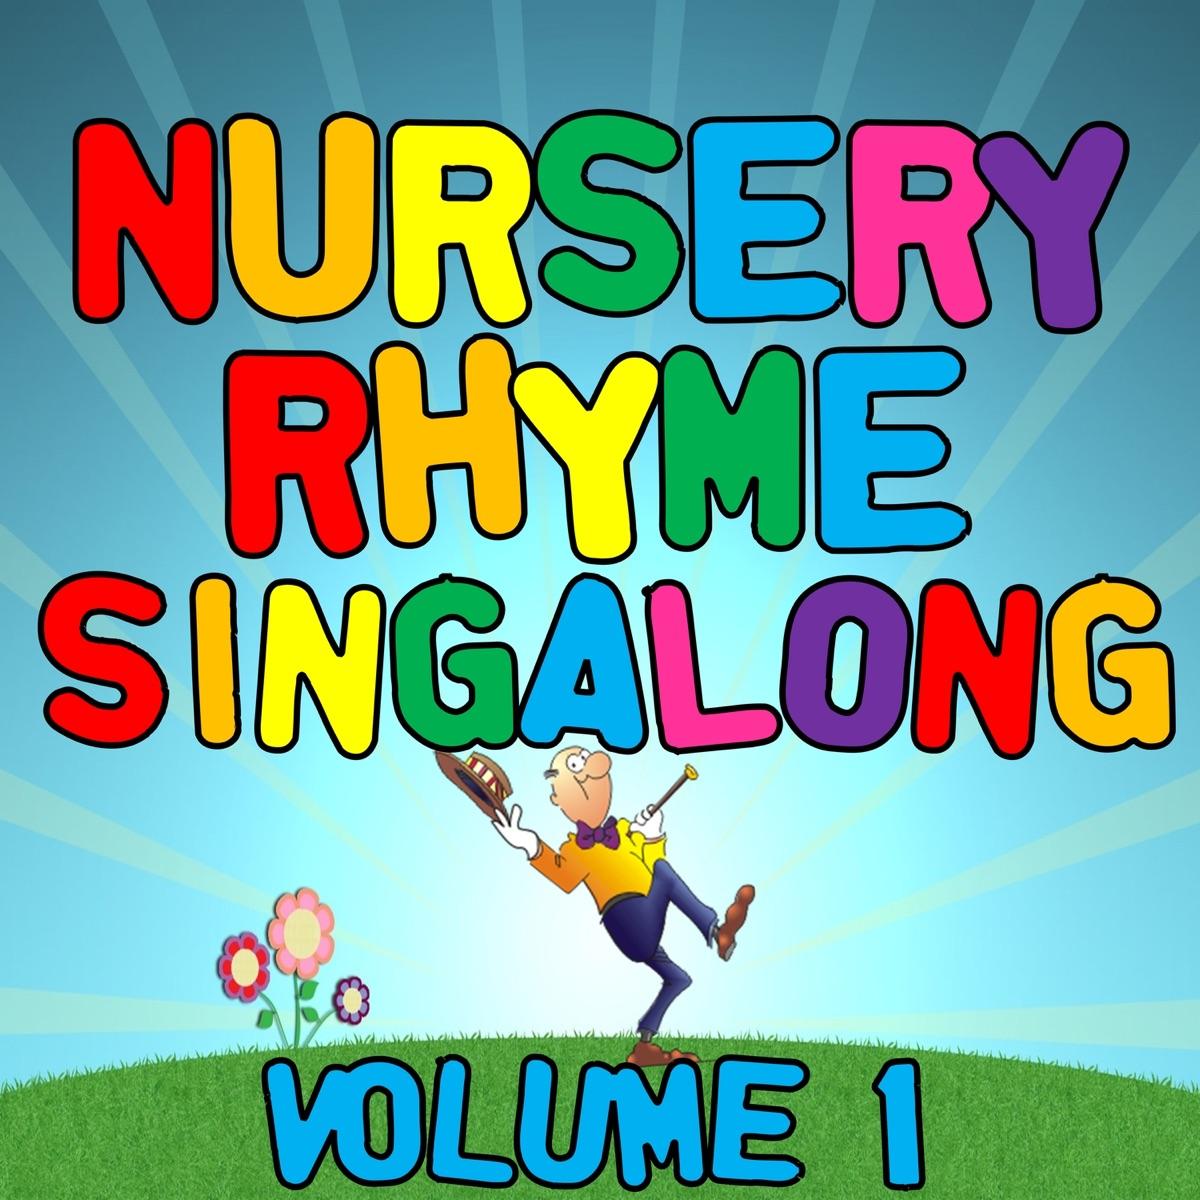 Kids Nursery Rhymes Singalong Hits, Vol  1 Album Cover by